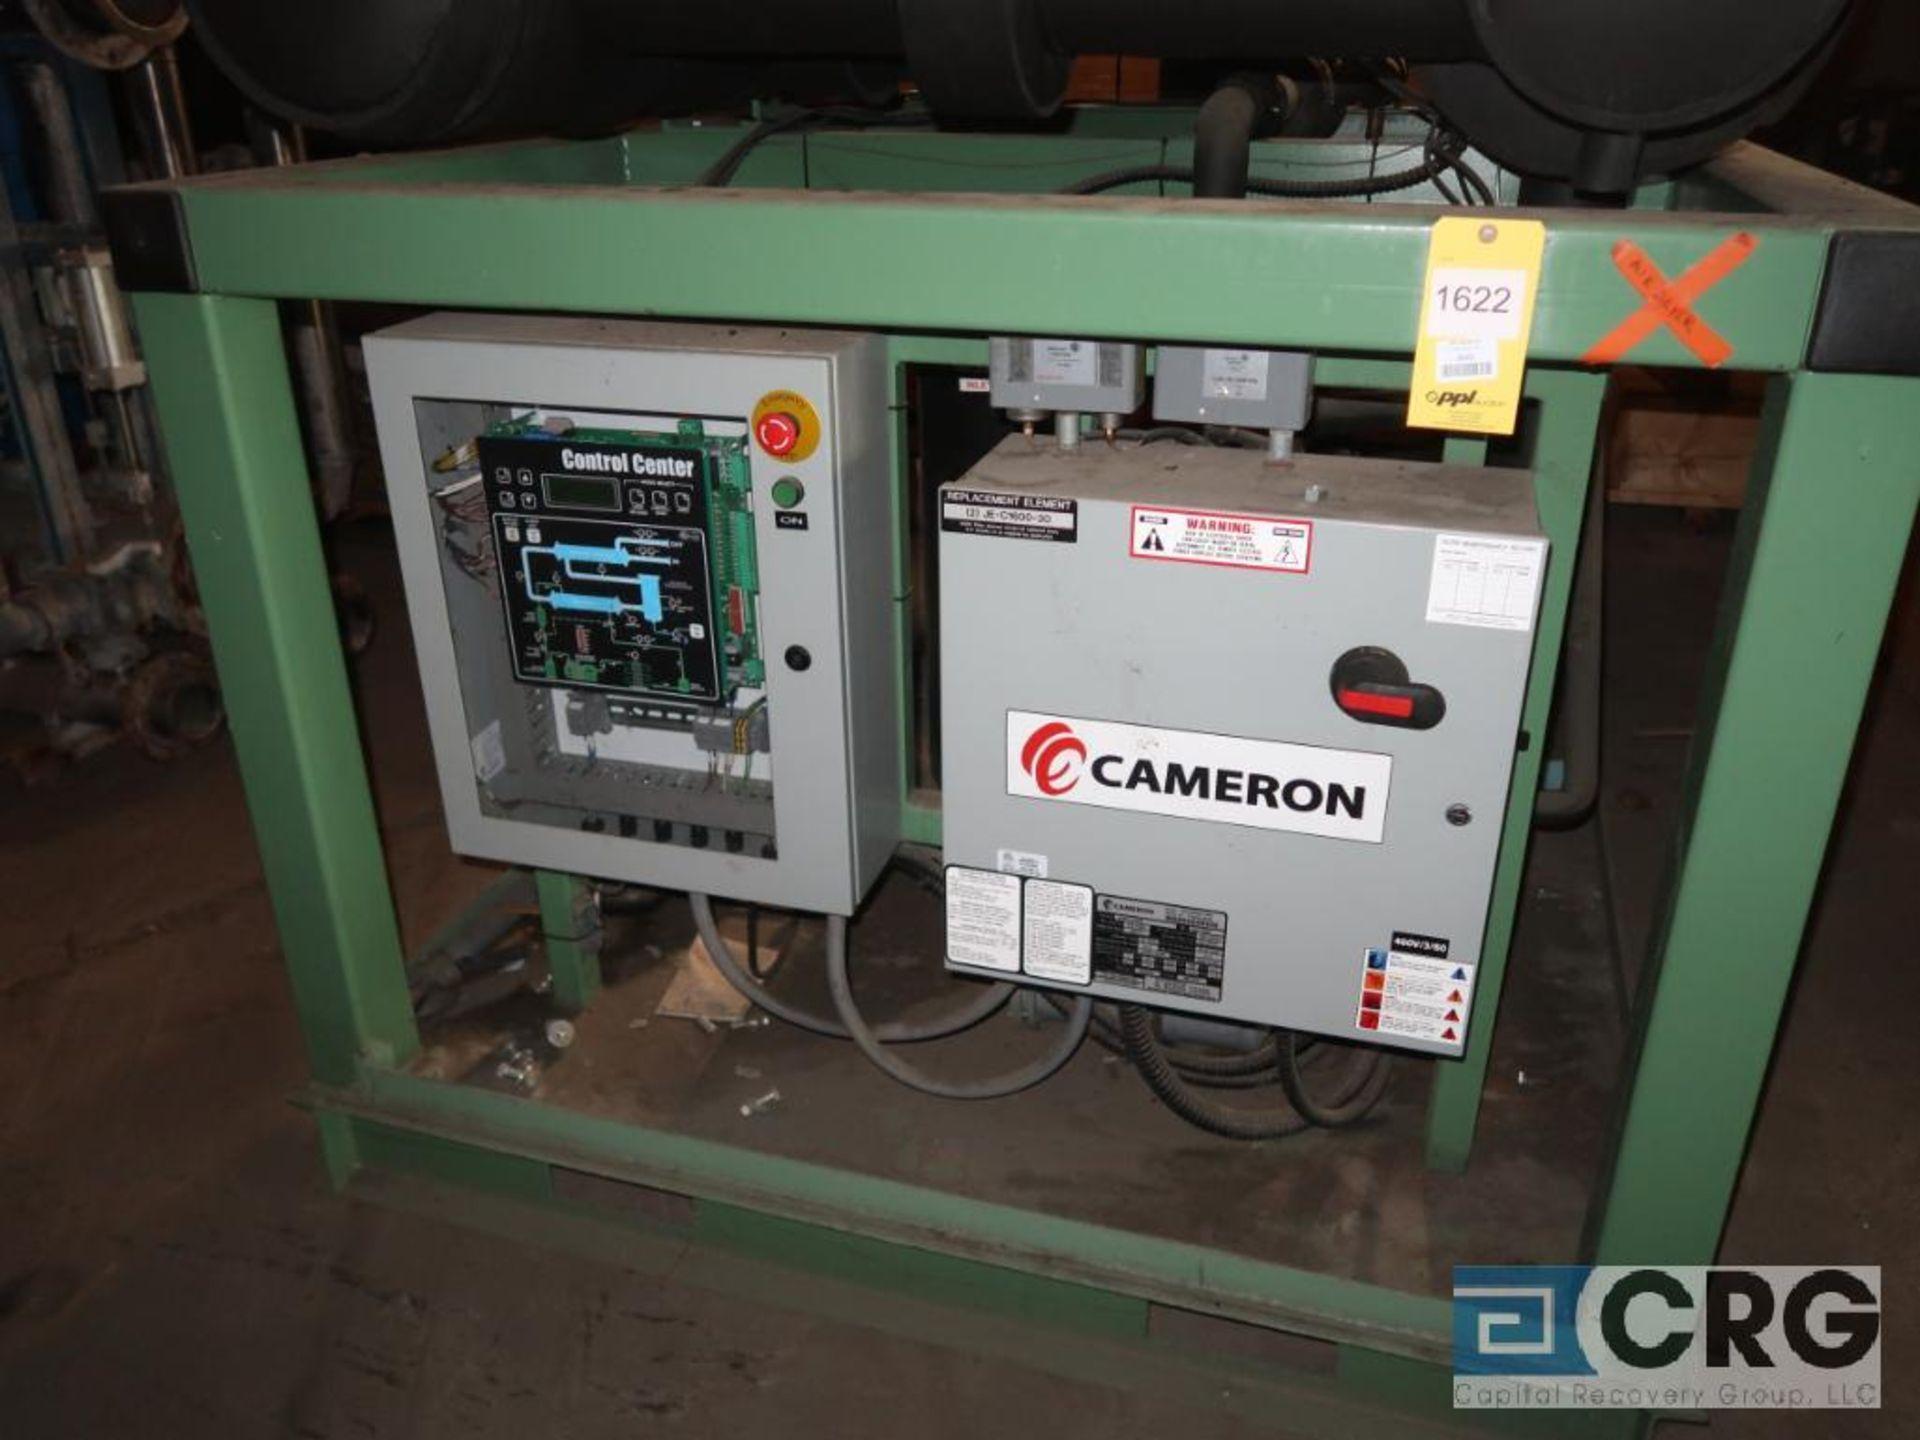 Cameron DC4000 W4 refrigeration/air dryer system, cap. 4,000 SCFM, MWP175, 460 volt (Off Site - Image 2 of 4